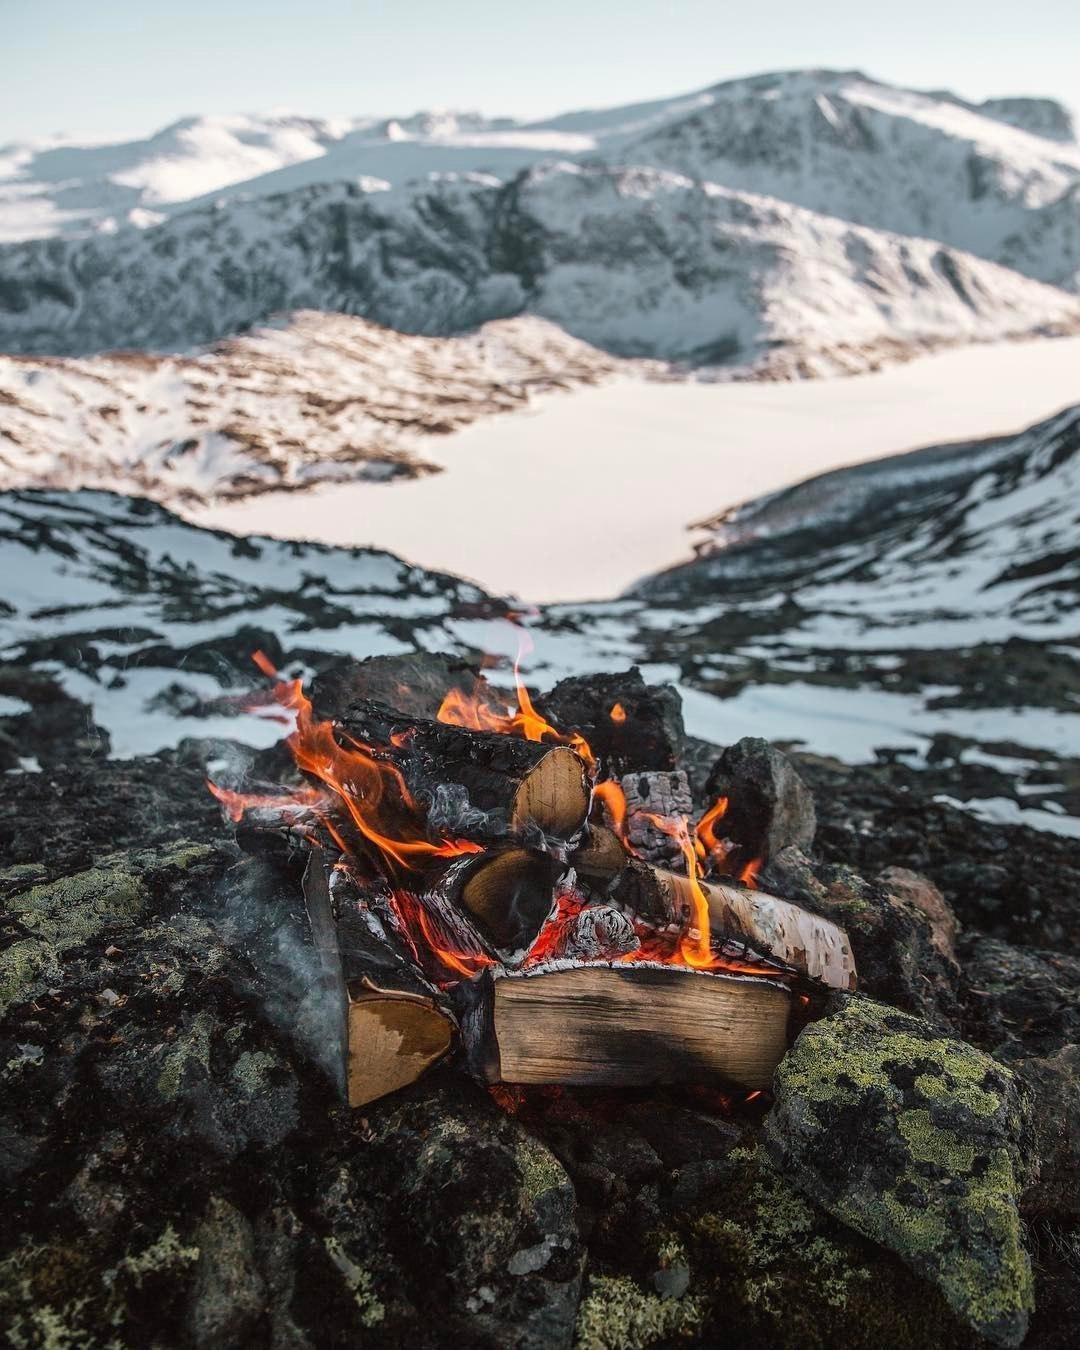 MnX2LjiLw8s - Норвегия - страна холодной красоты